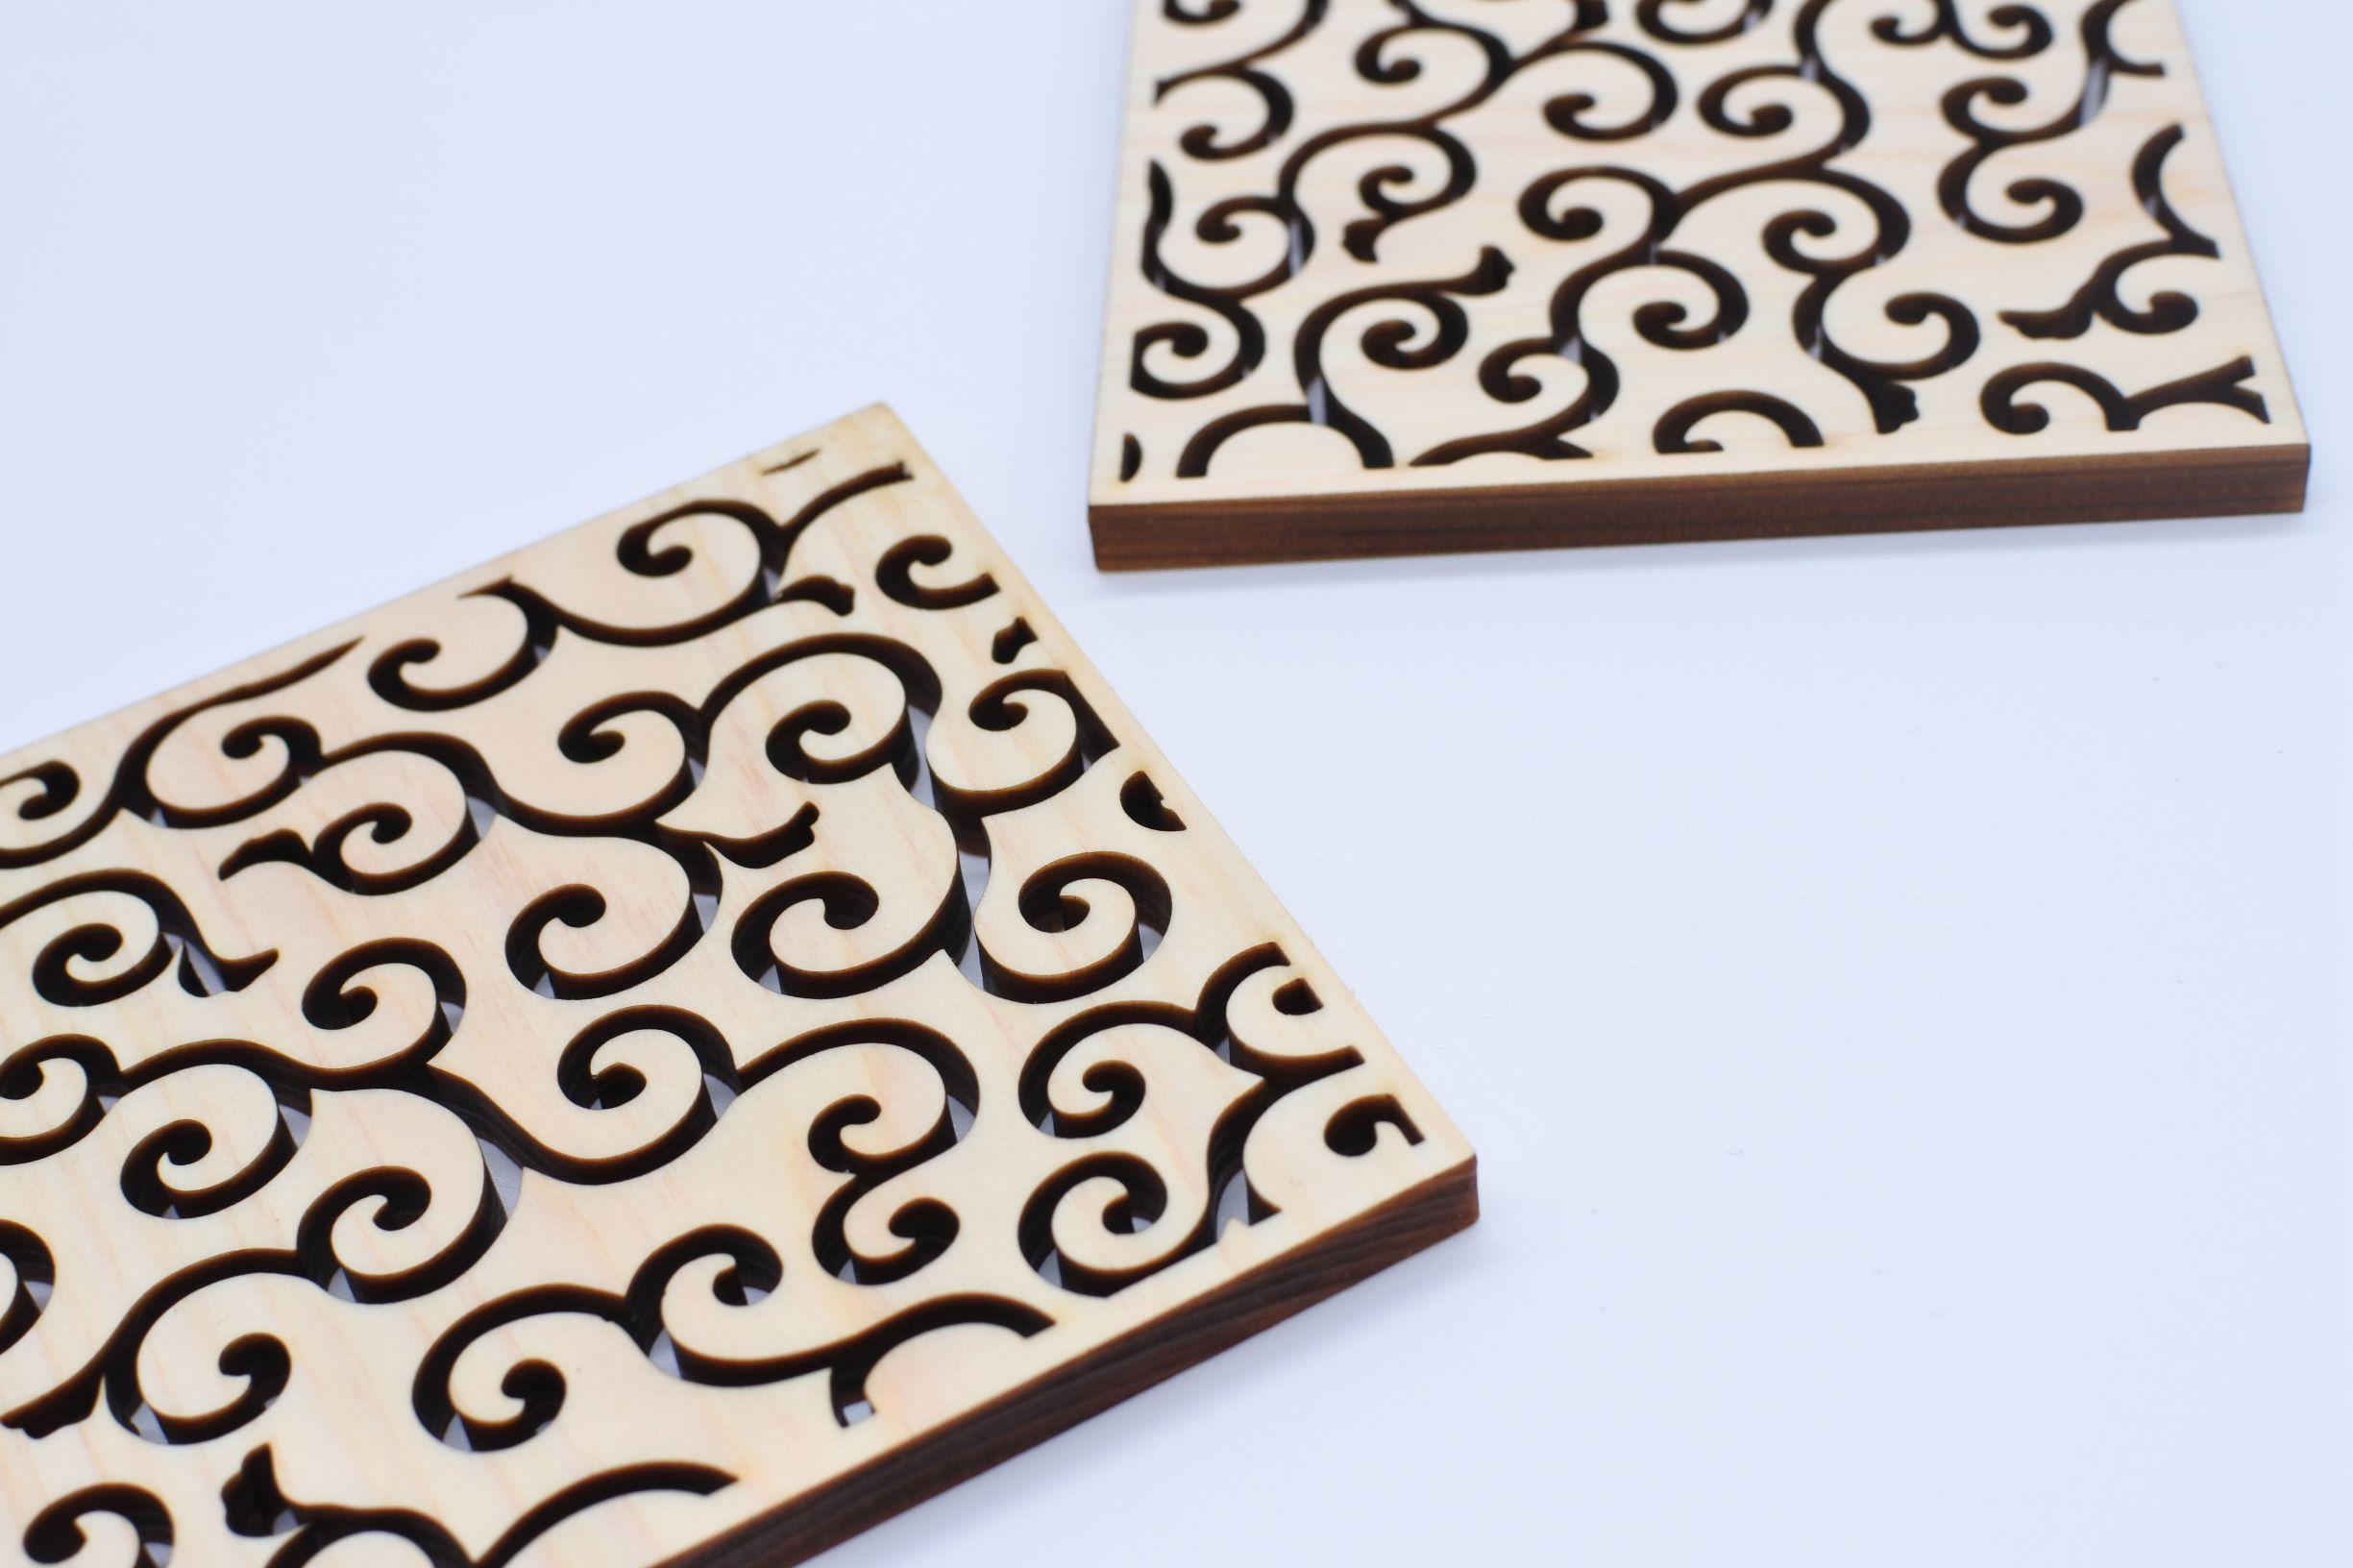 Natural Wooden Handmade Coaster Made of Nikko Cypress Drinkware Japanese Patterns